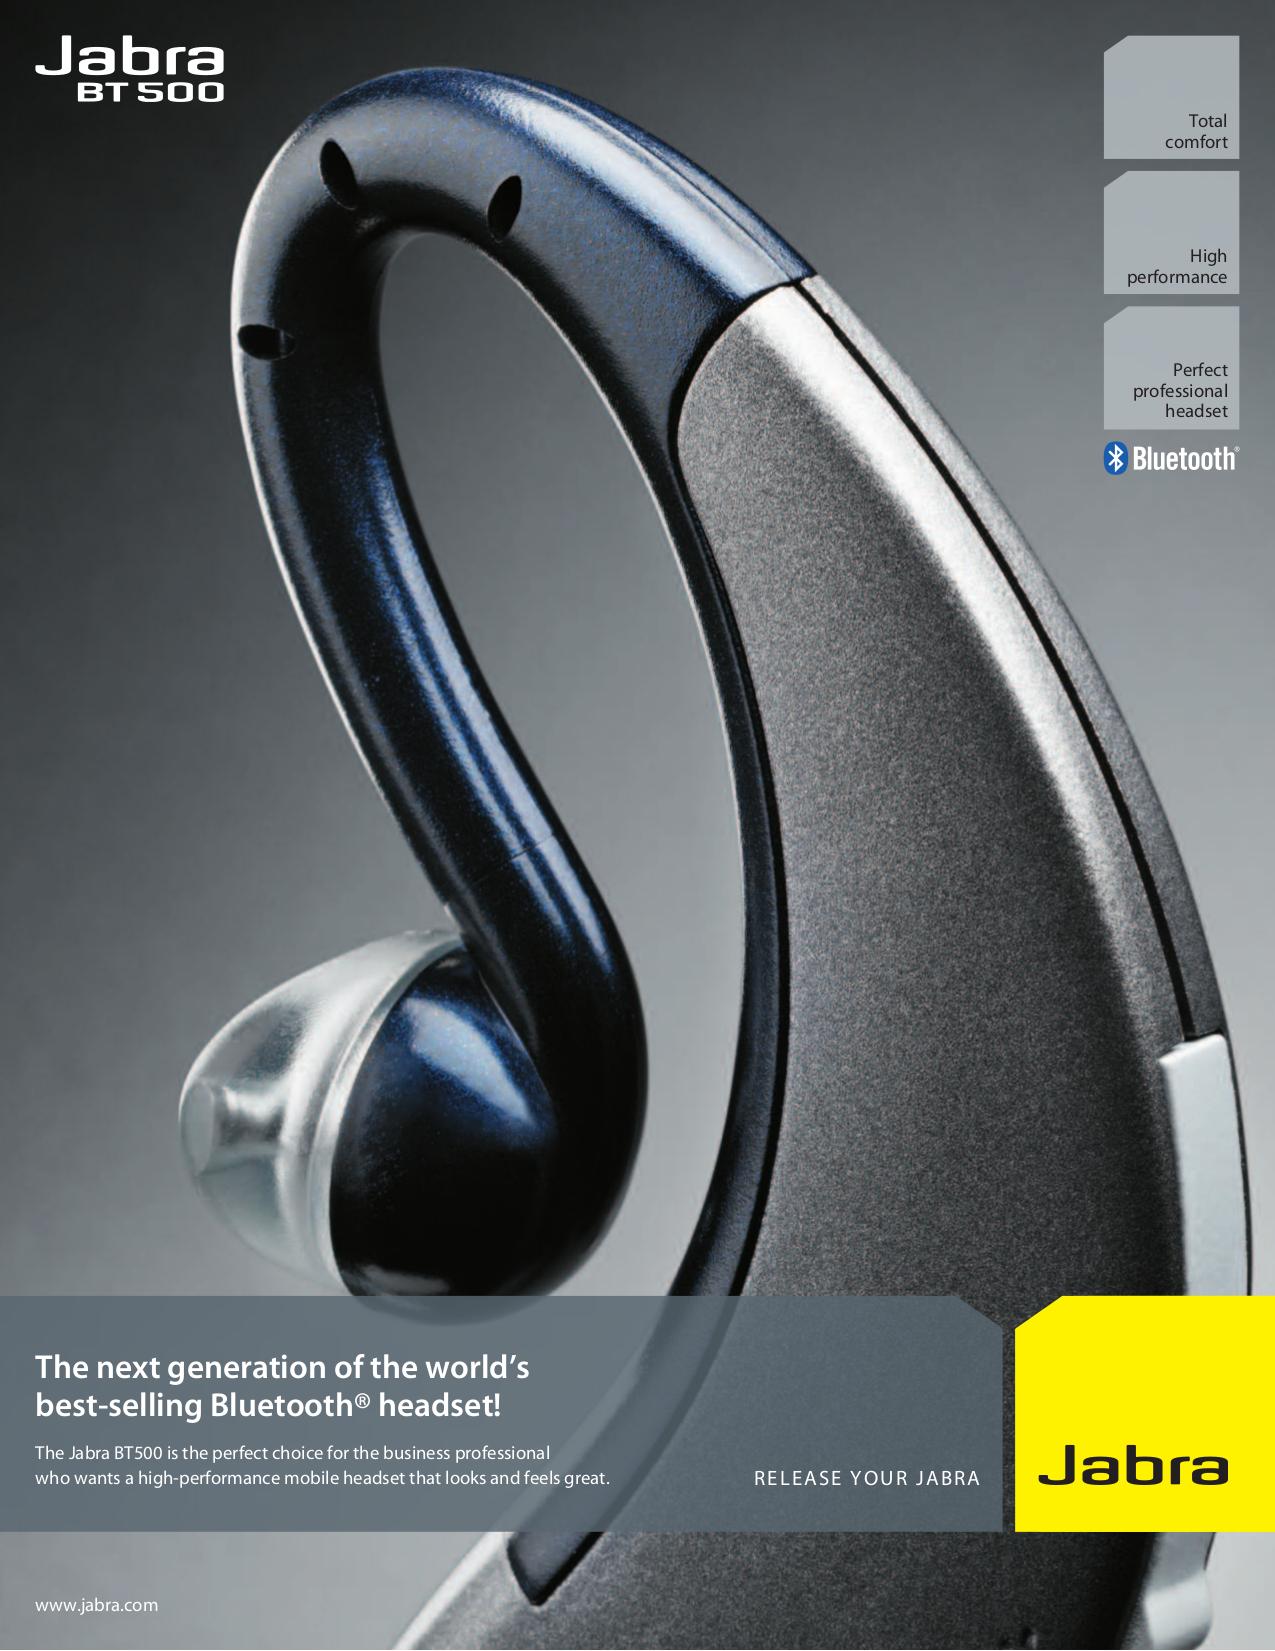 download free pdf for jabra bt500 headset manual rh umlib com Jabra User Manual Jabra Owner's Manual